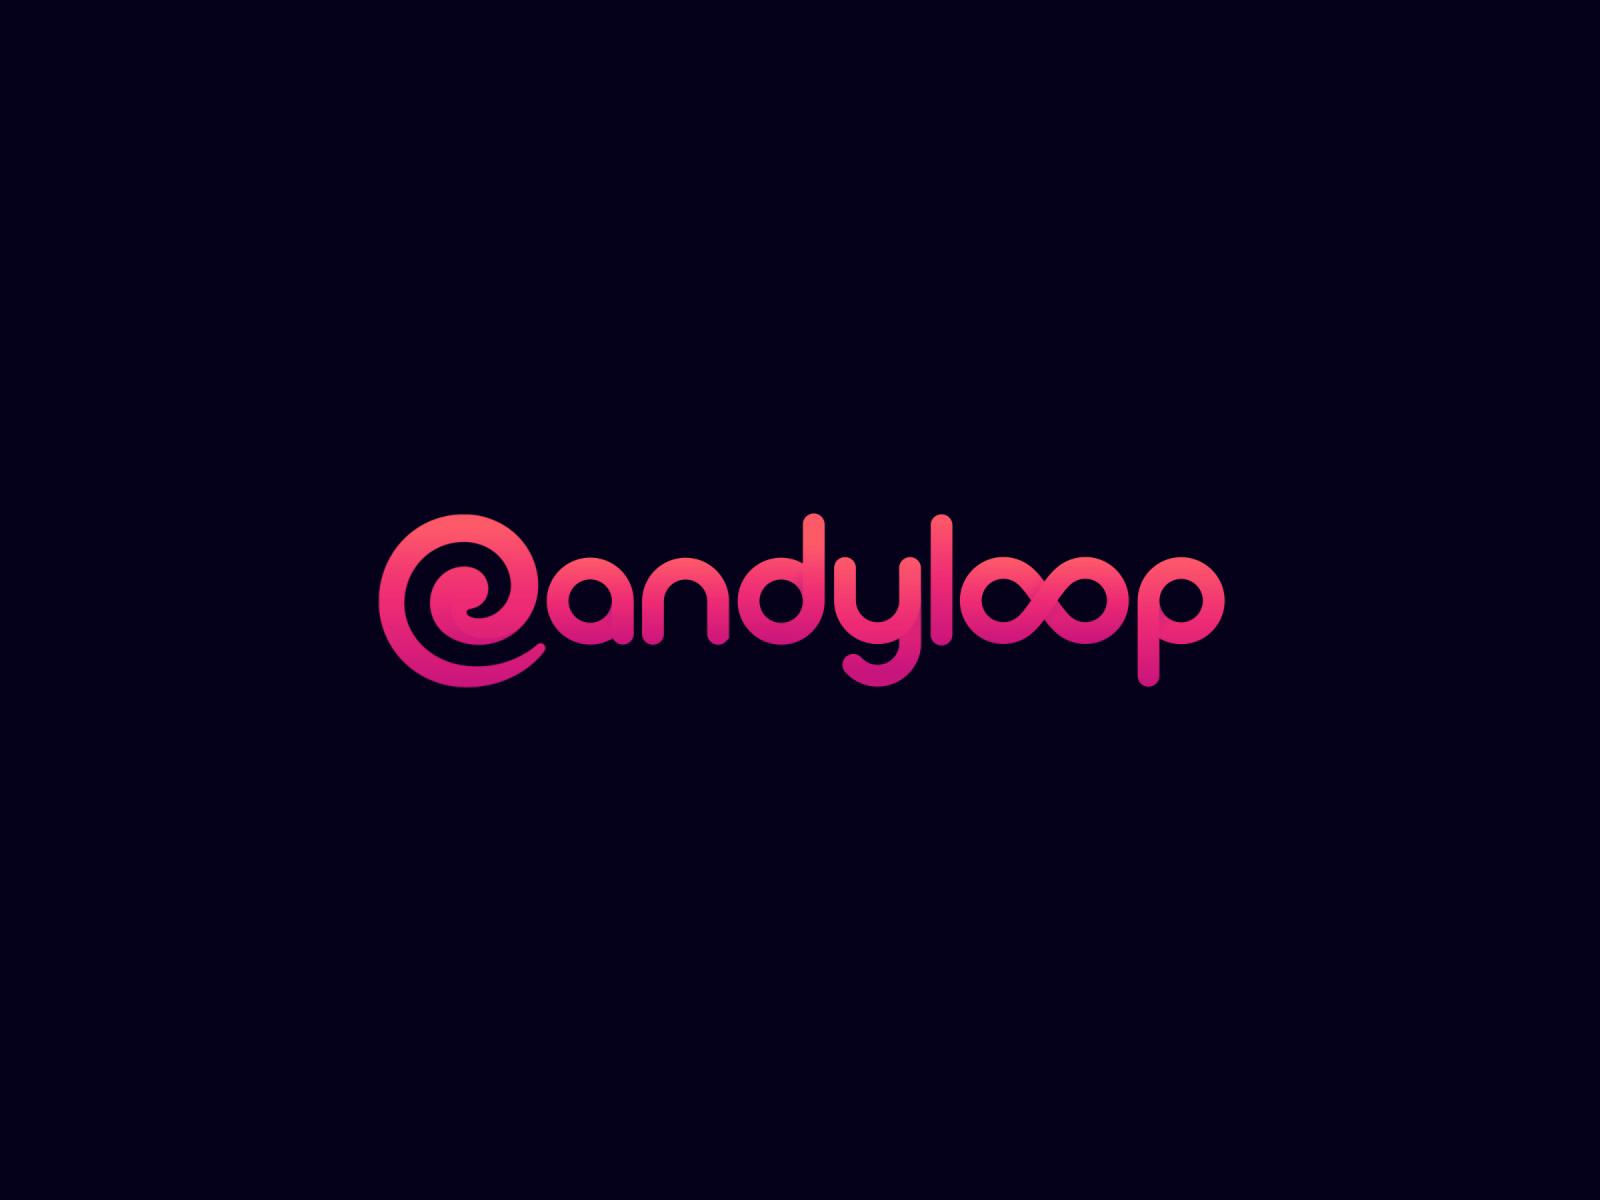 Candyloop